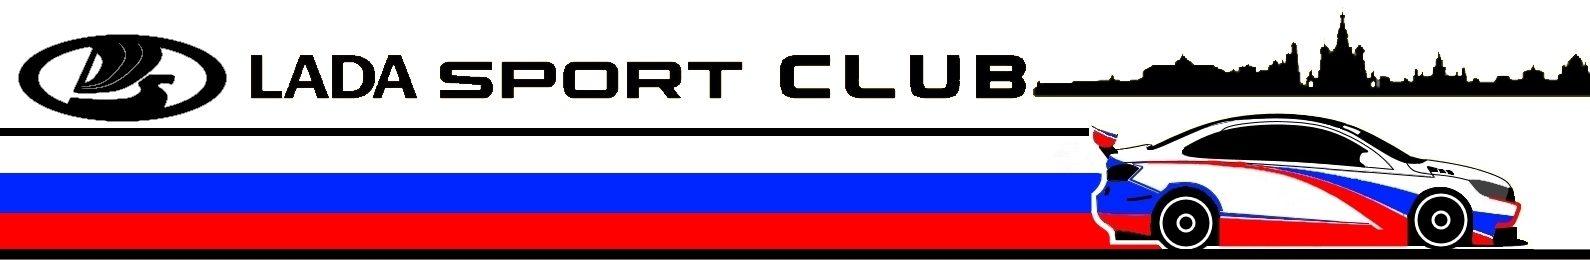 LADA Sport Club | ЛАДА Спорт Клуб